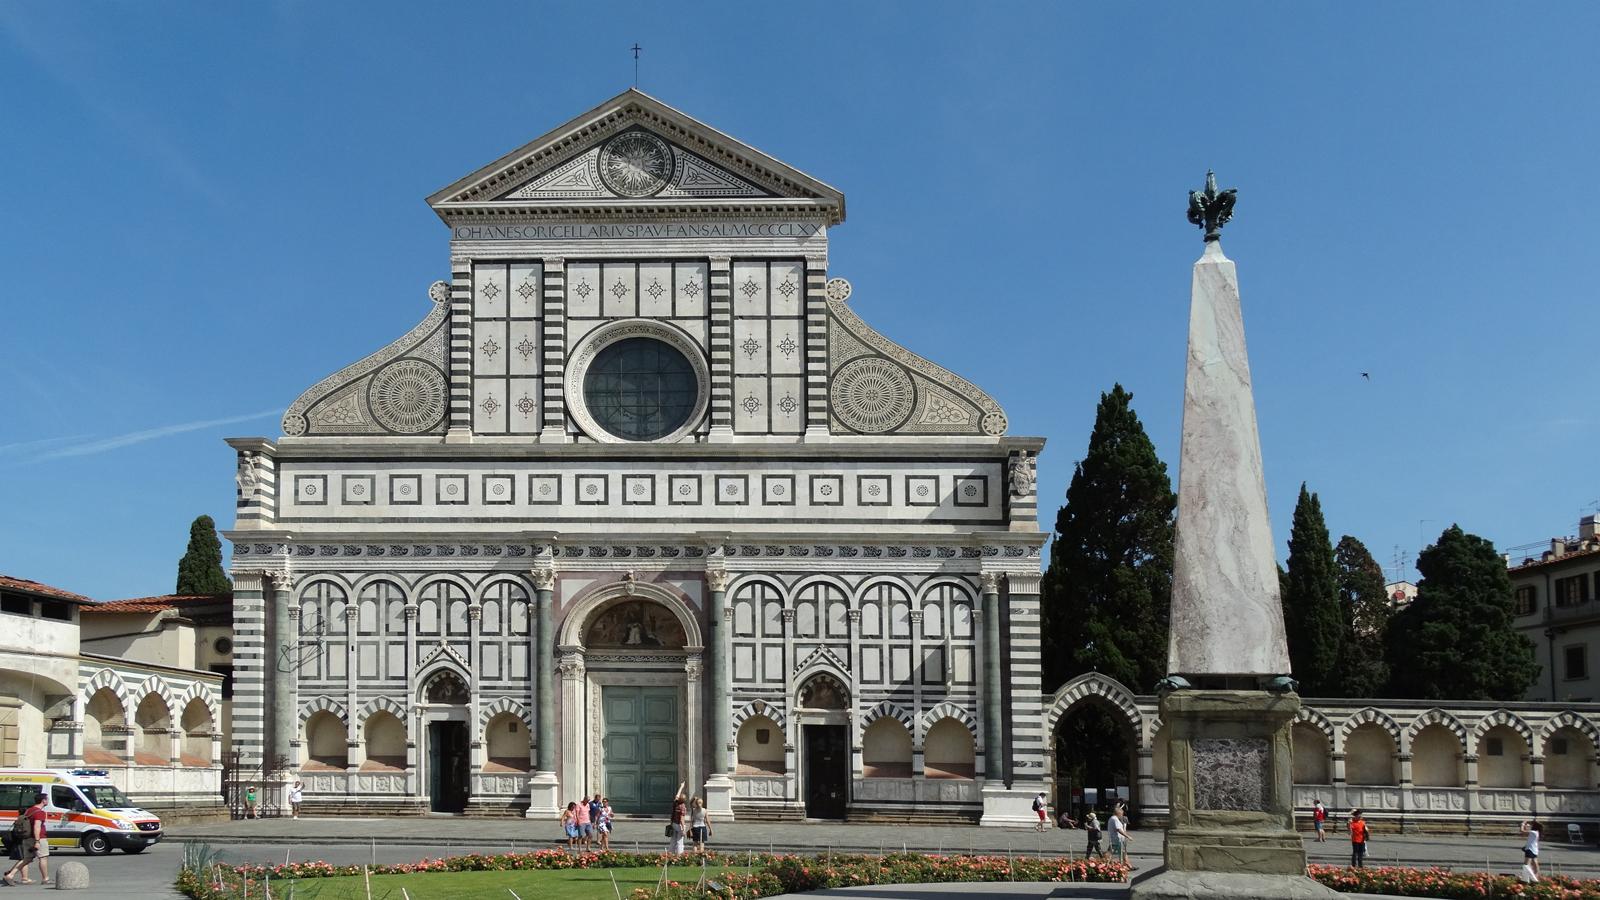 De Basilica di Santa Maria Novella door Leon Battista Alberti (Firenze)